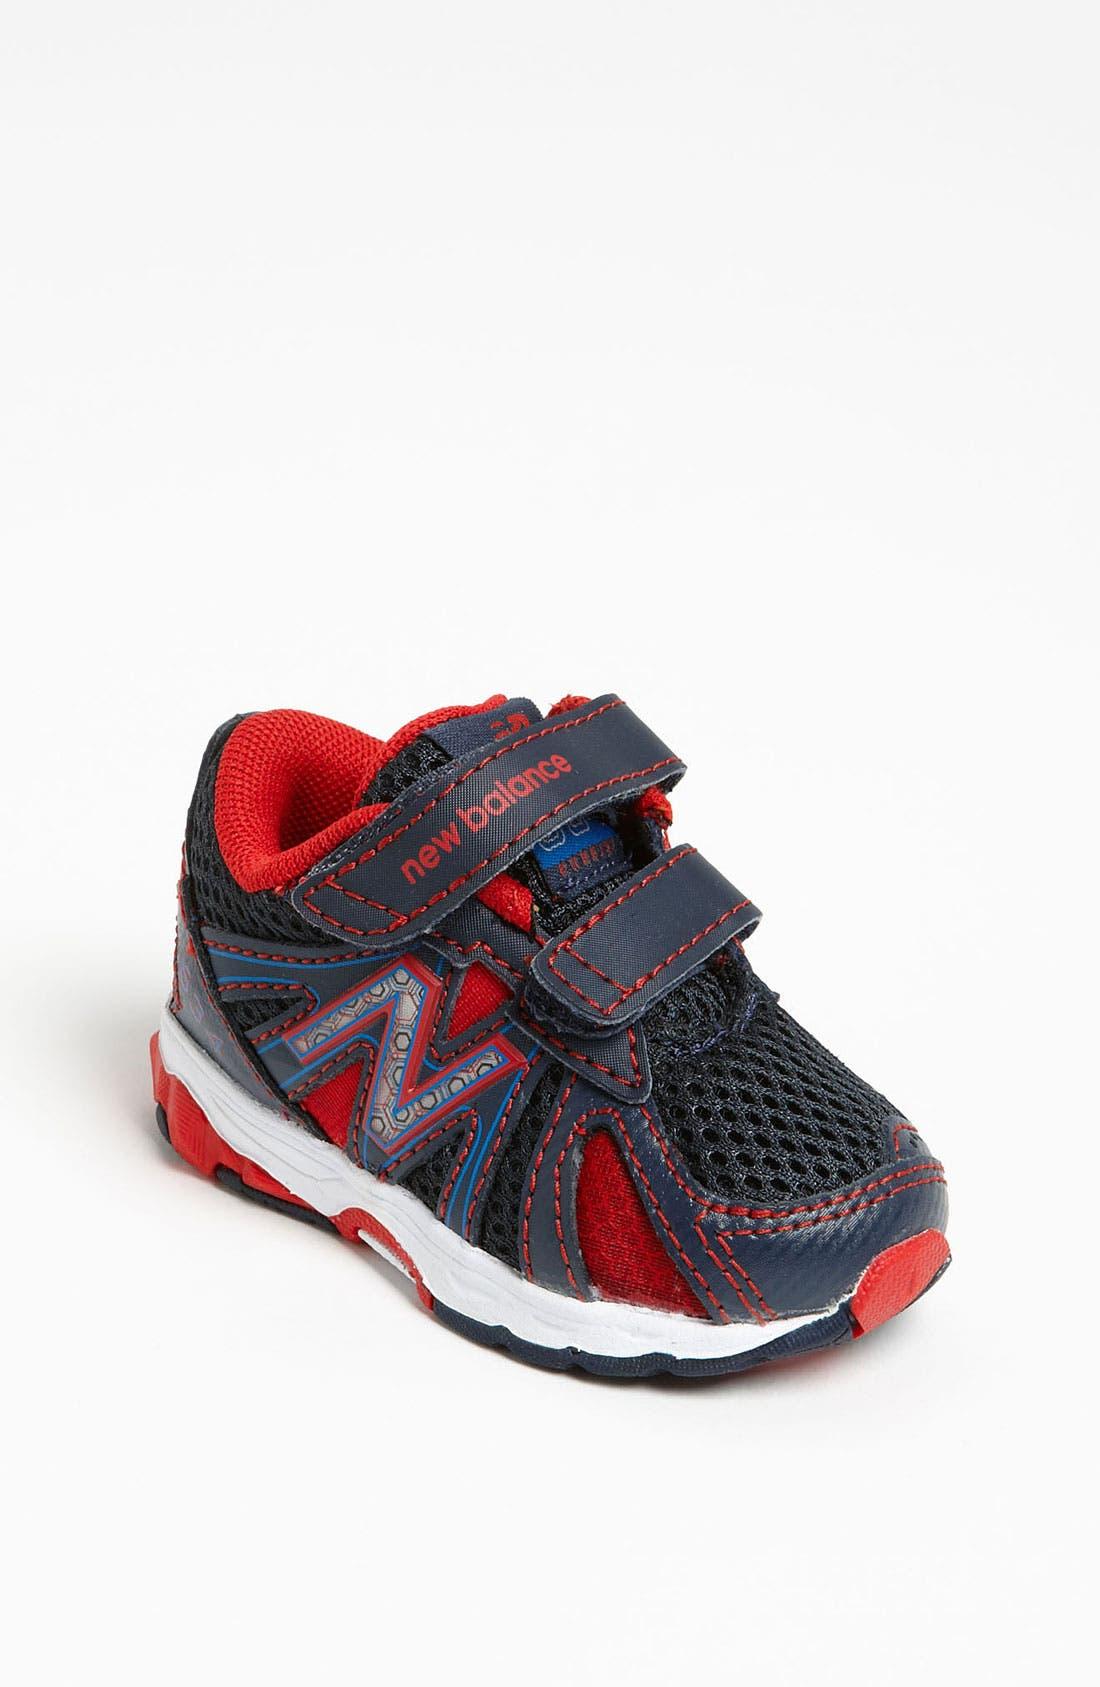 Alternate Image 1 Selected - New Balance '634' Running Shoe (Baby, Walker, & Toddler)